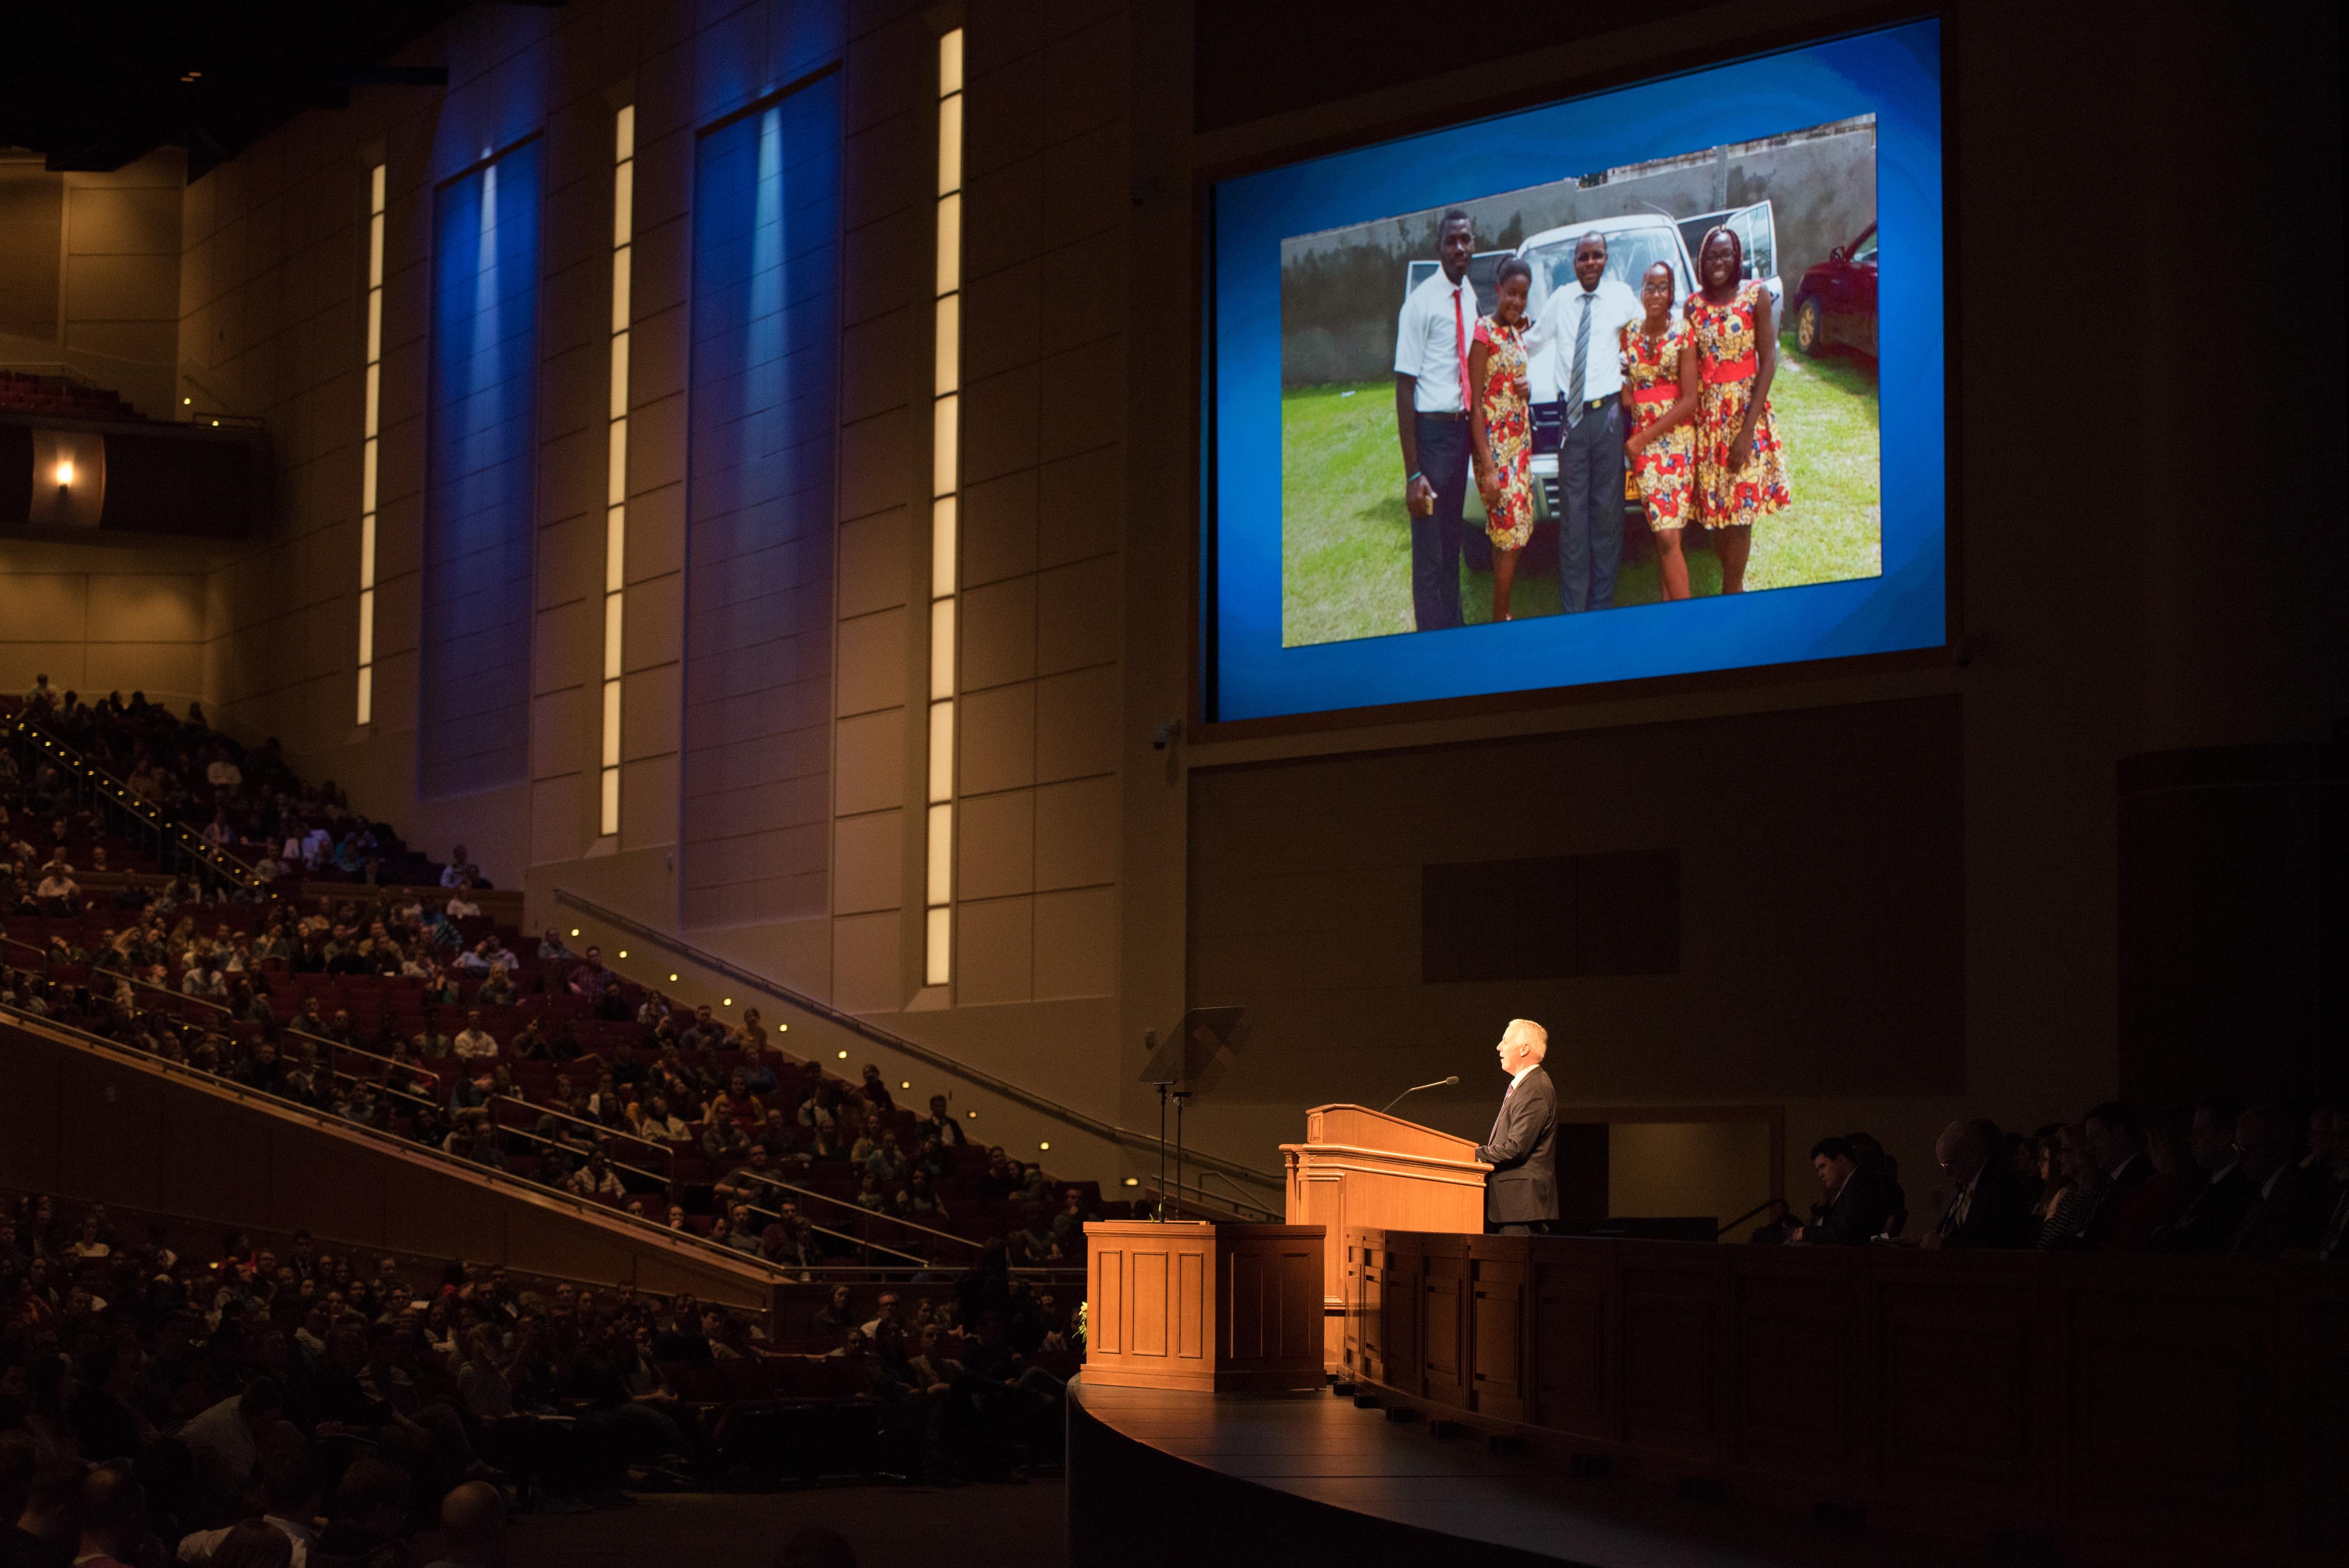 Elder Kevin S. Hamilton, General Authority Seventy, speaks at a BYU-Idaho devotional on March 12, 2019.